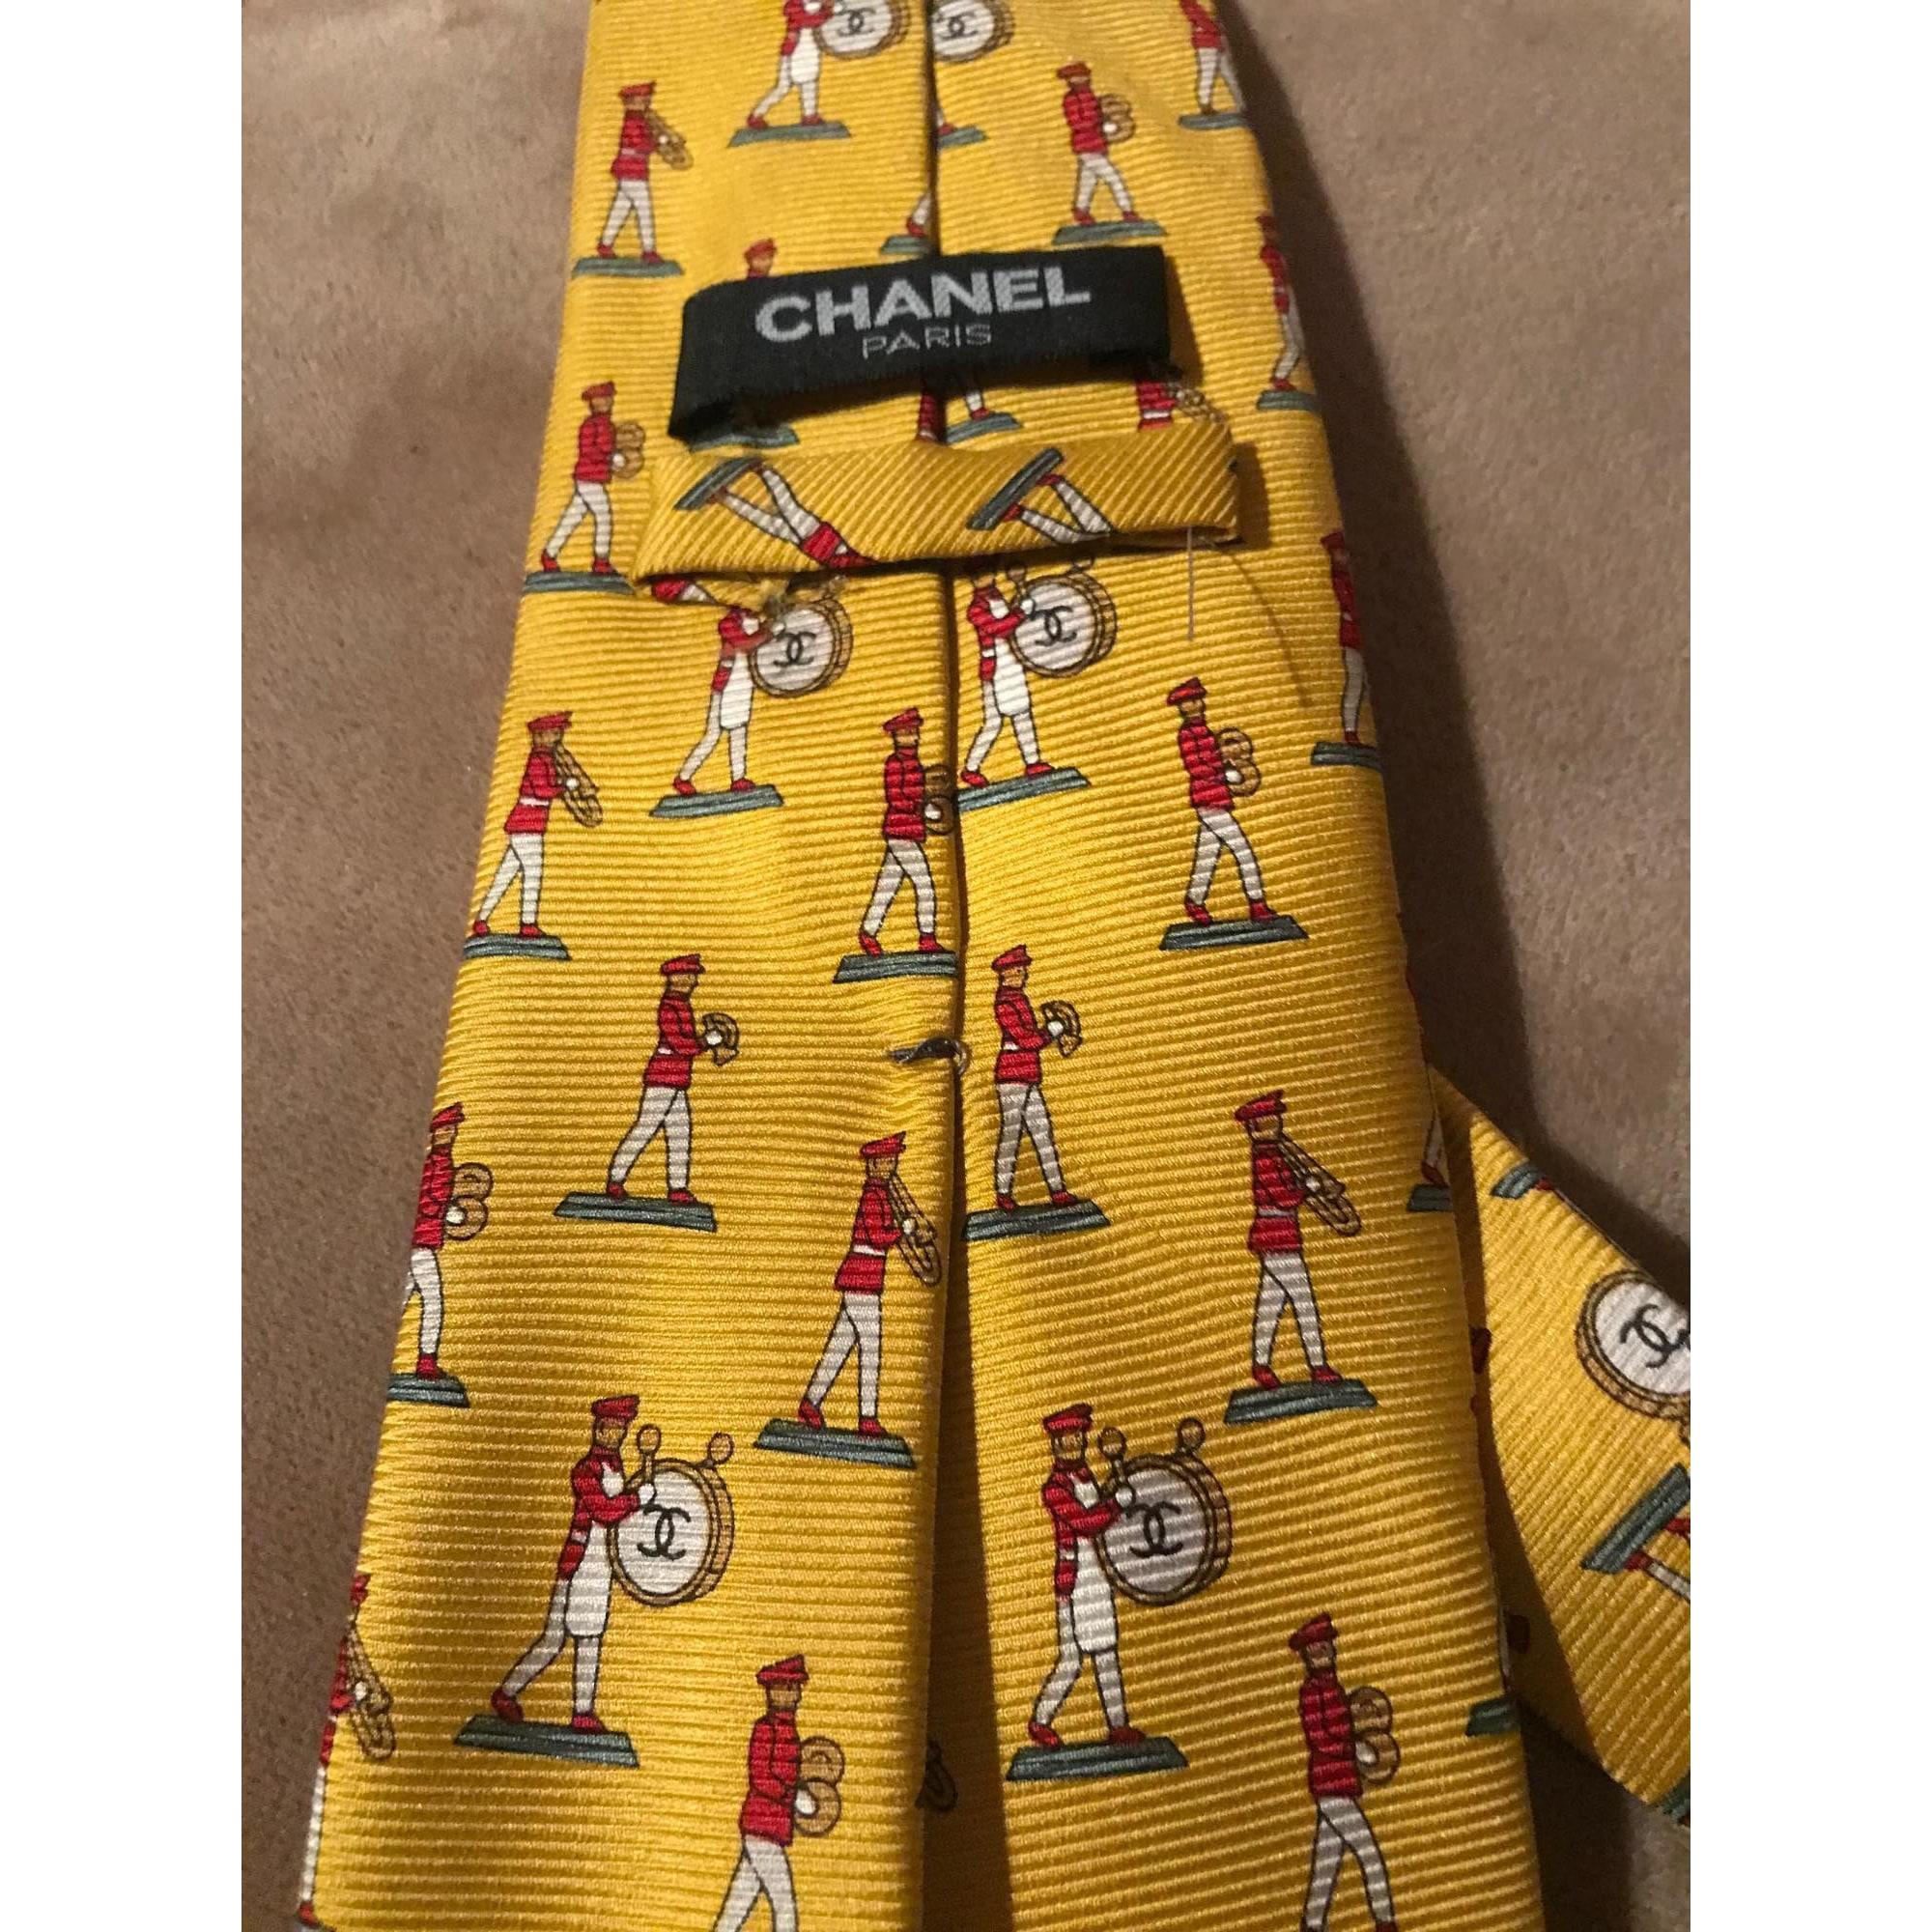 Tie CHANEL Yellow